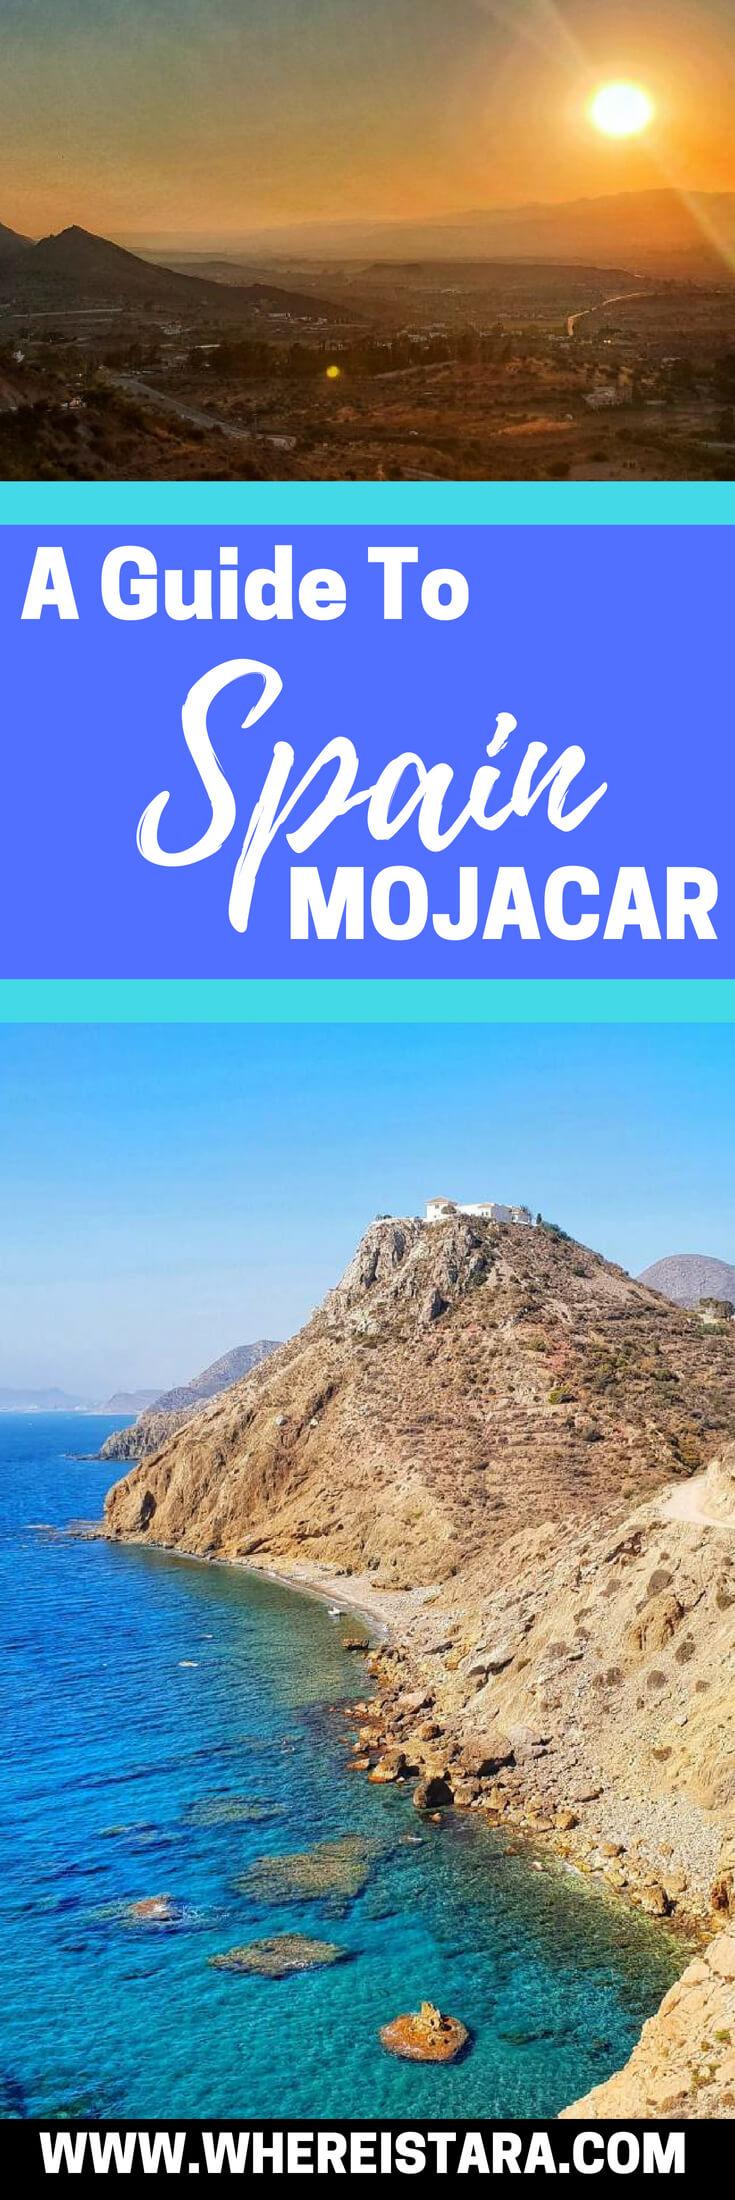 Things to do in Mojacar Spain hotels in Mojacar restaurants in Mojacar